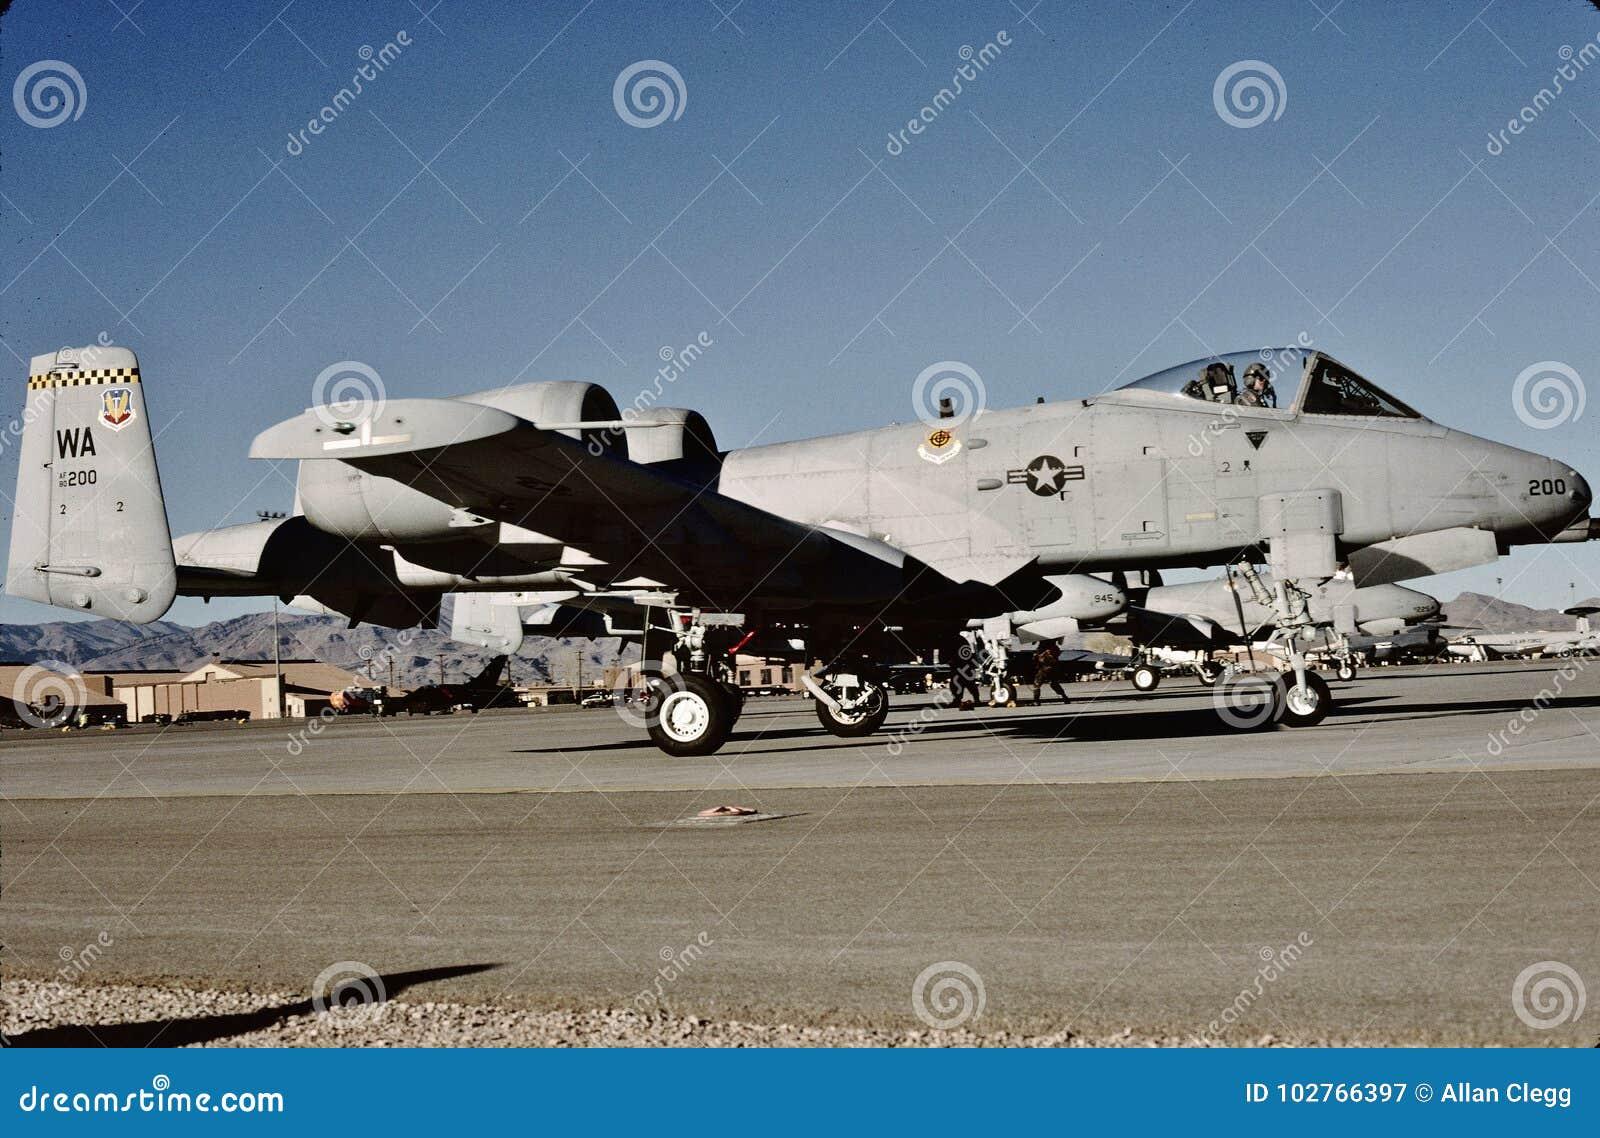 USAF Republic Fairchild A-10A 80-200 at Nellis AFB